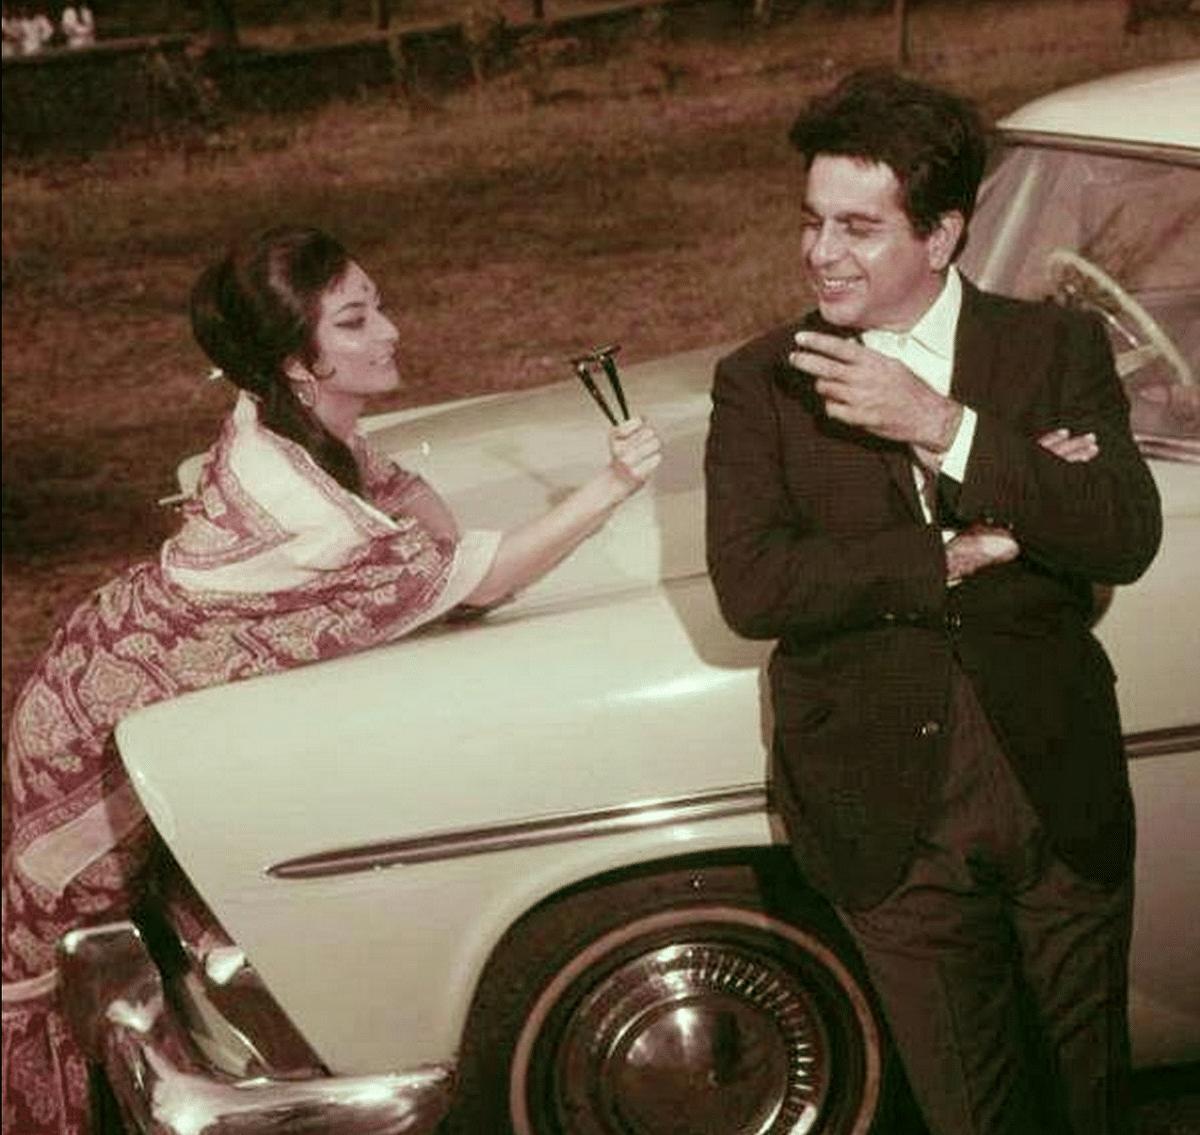 Saira Banu and Dilip Kumar had adorable chemistry on screen.